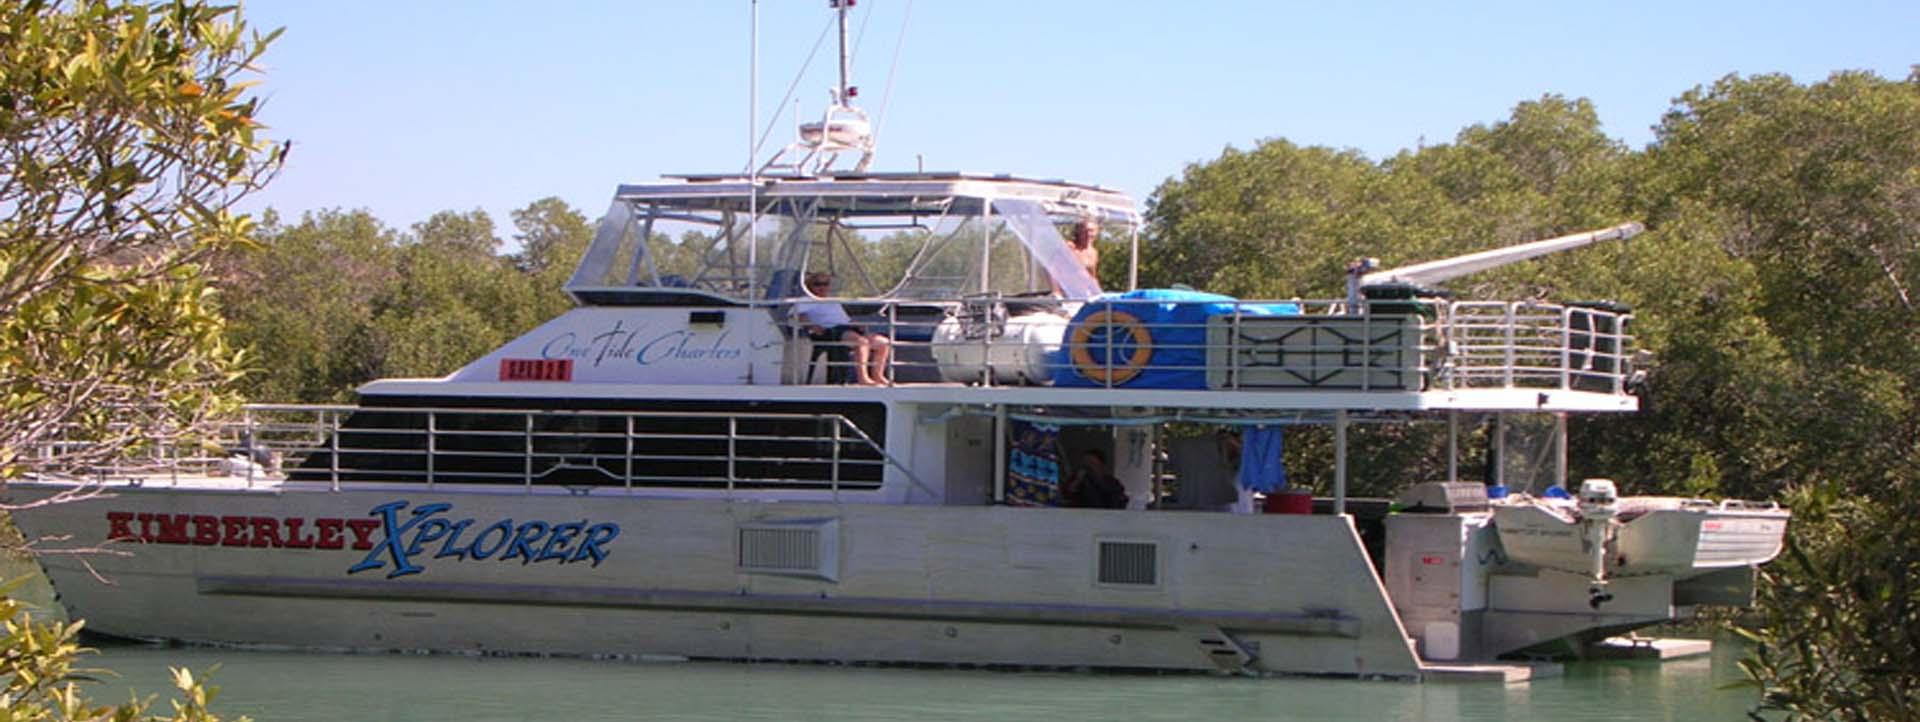 KIMBERLEY XPLORER boat side profile slider